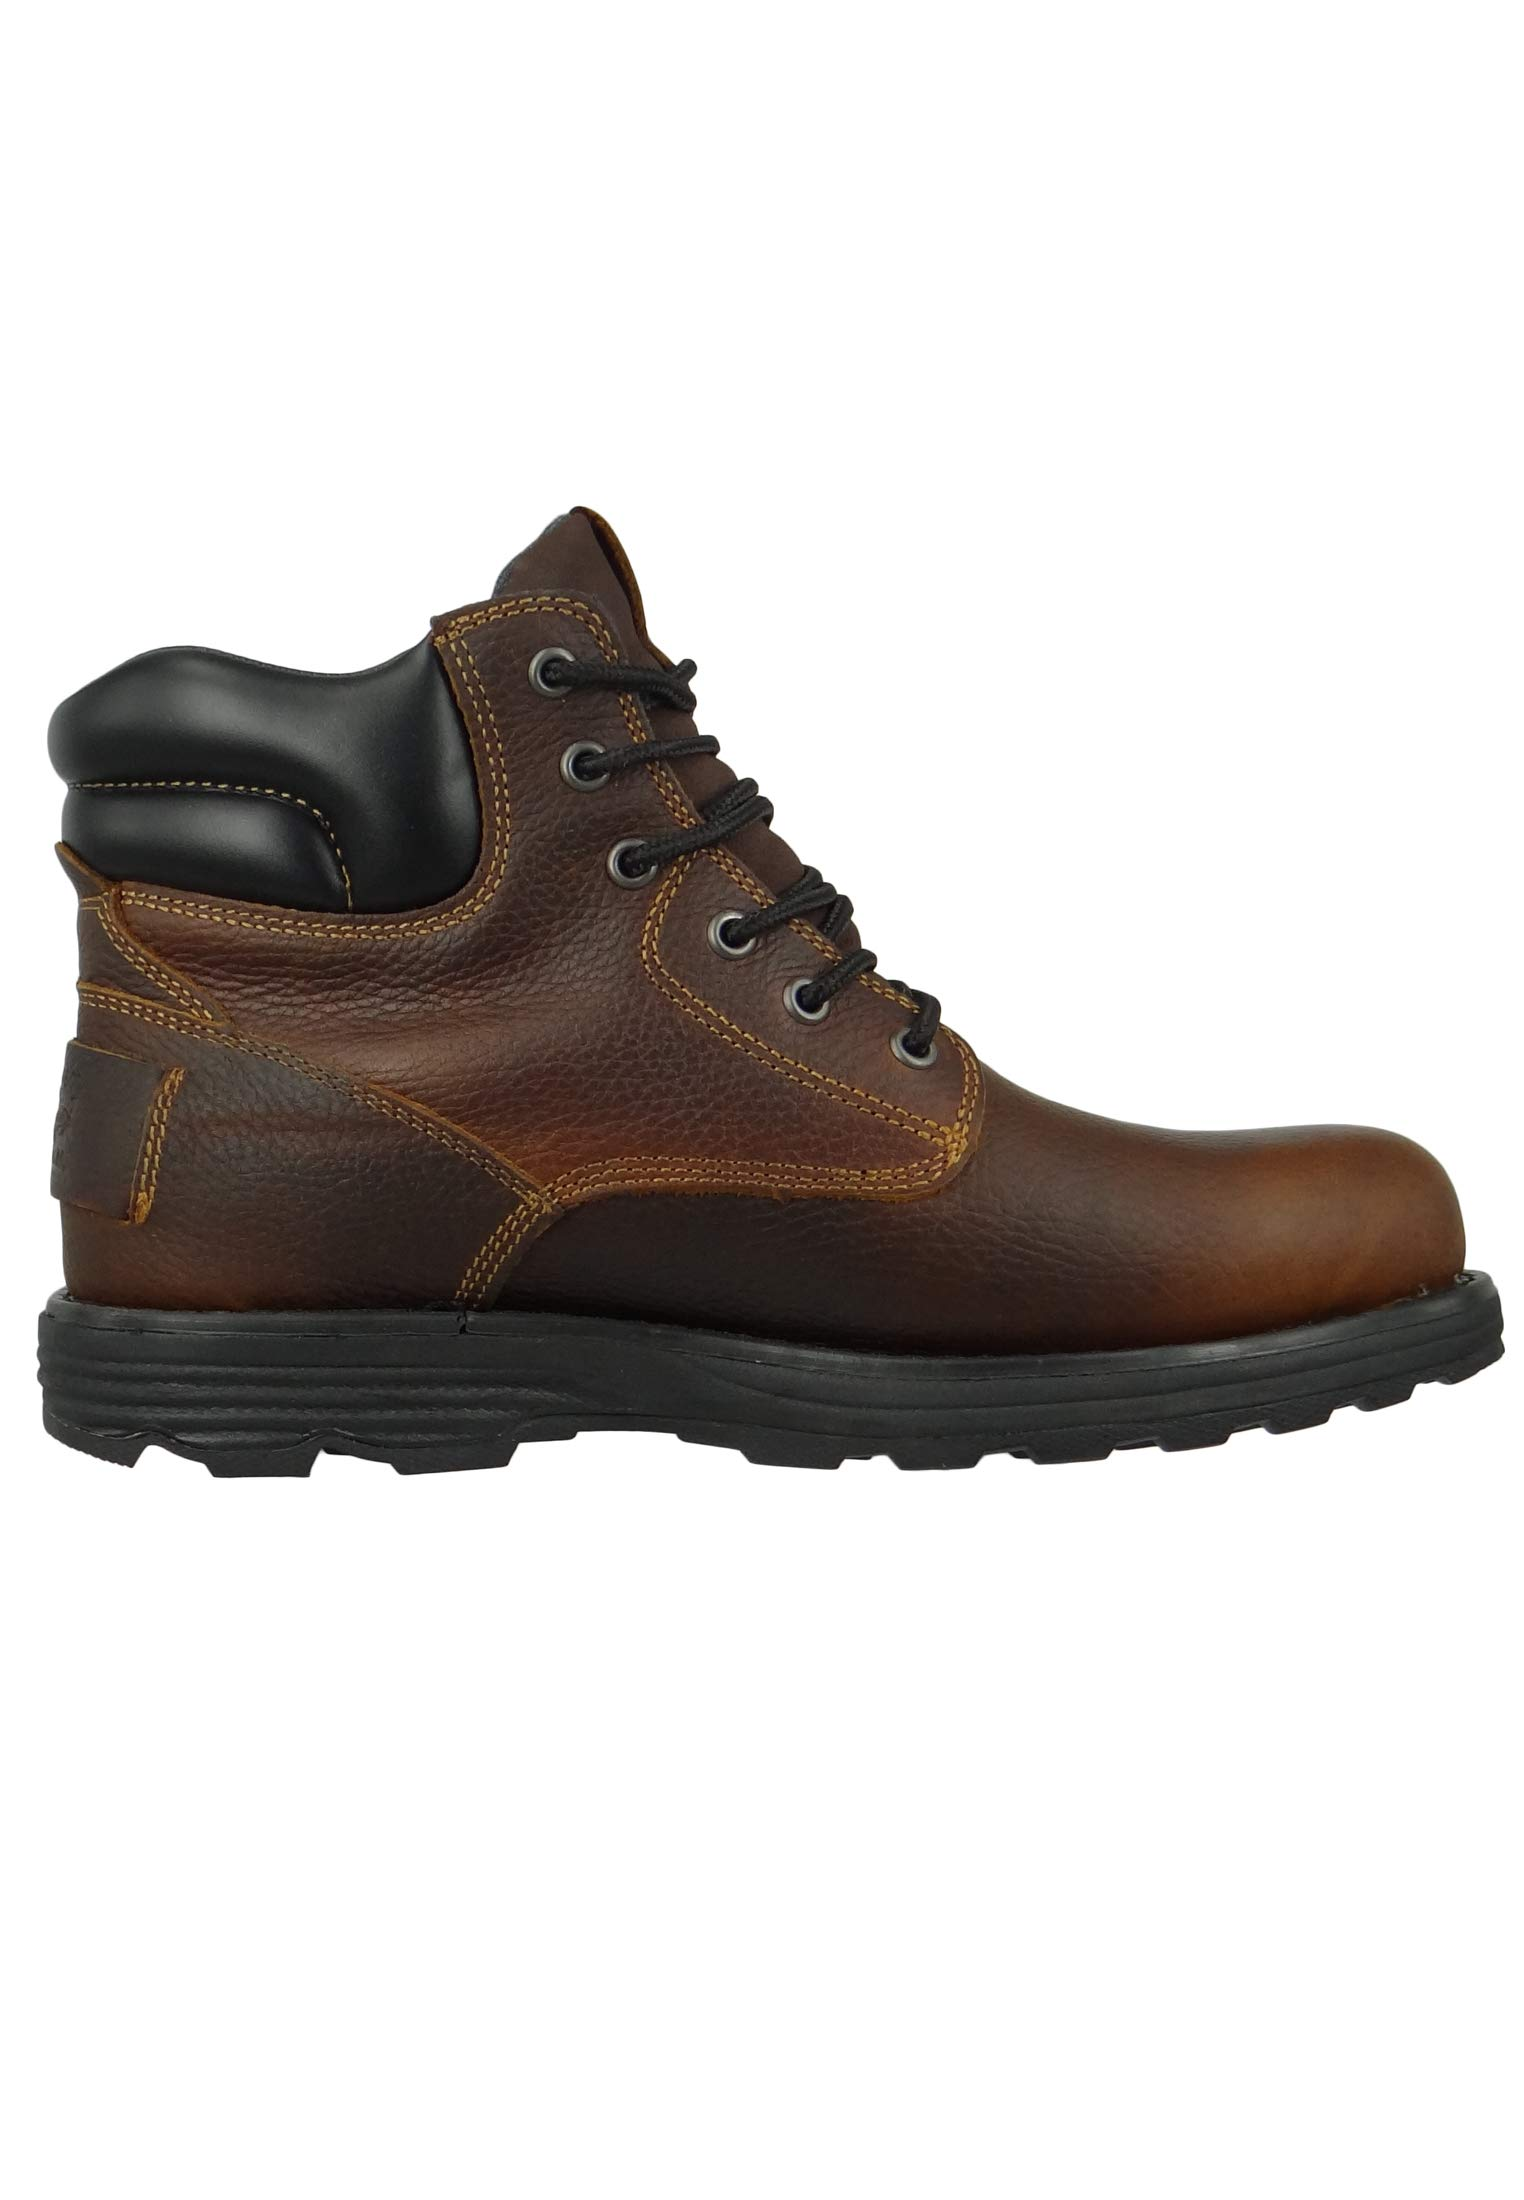 Levi's Arrowhead 228777-829-128 Men's Walking Boots Brown 4